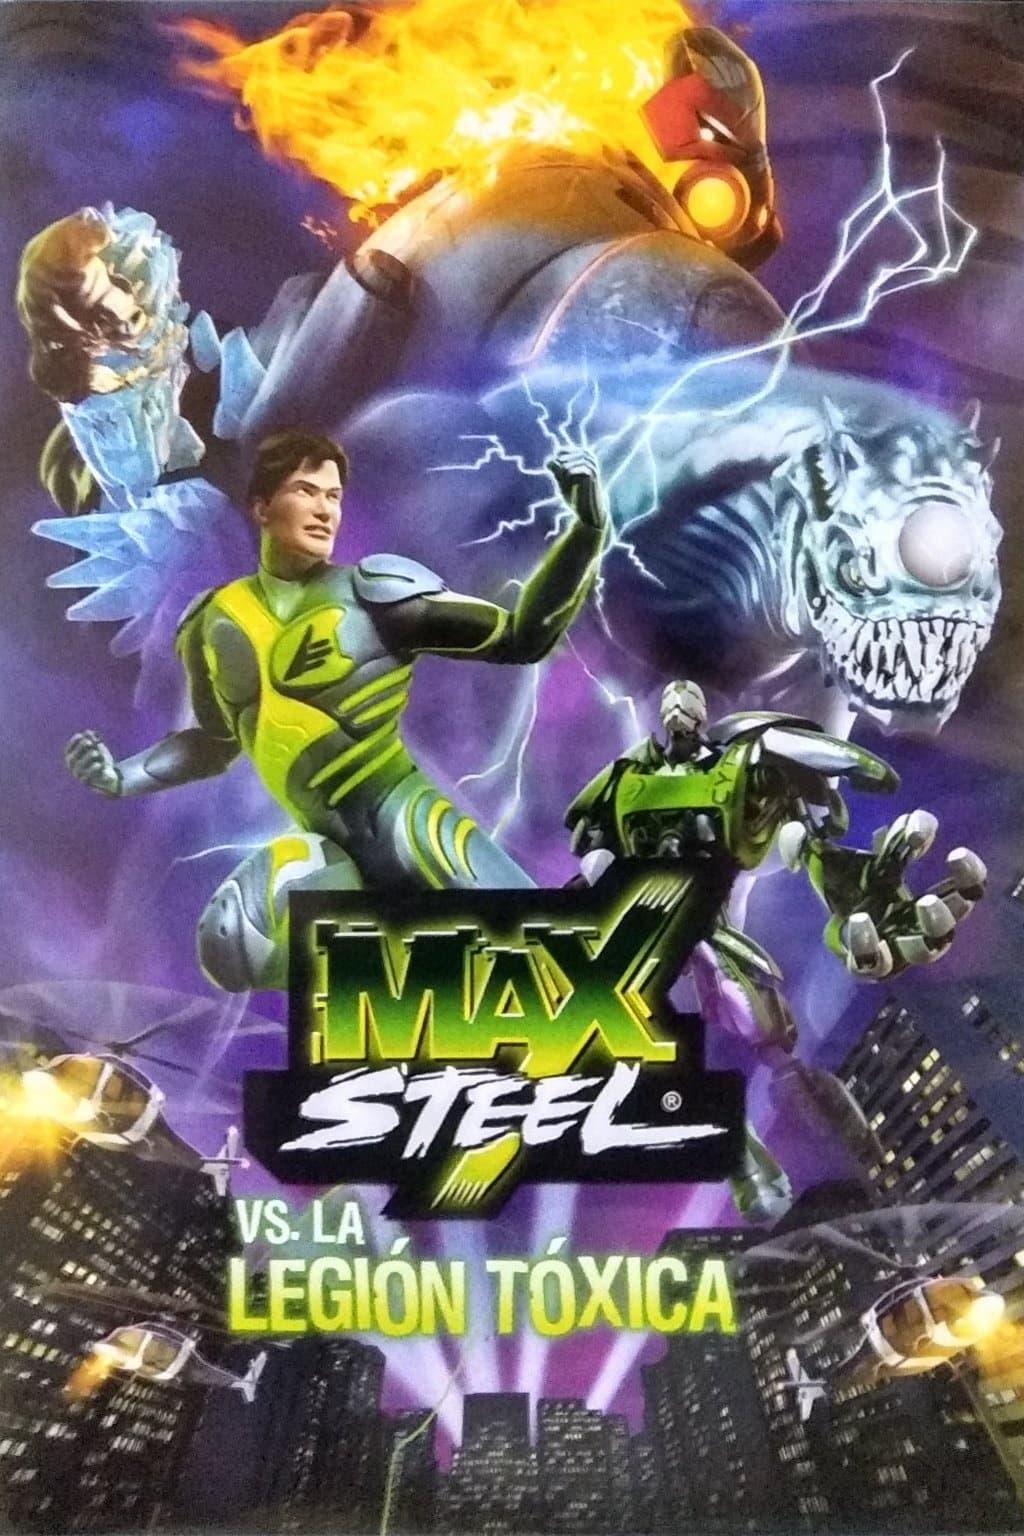 Max Steel vs The Toxic Legion